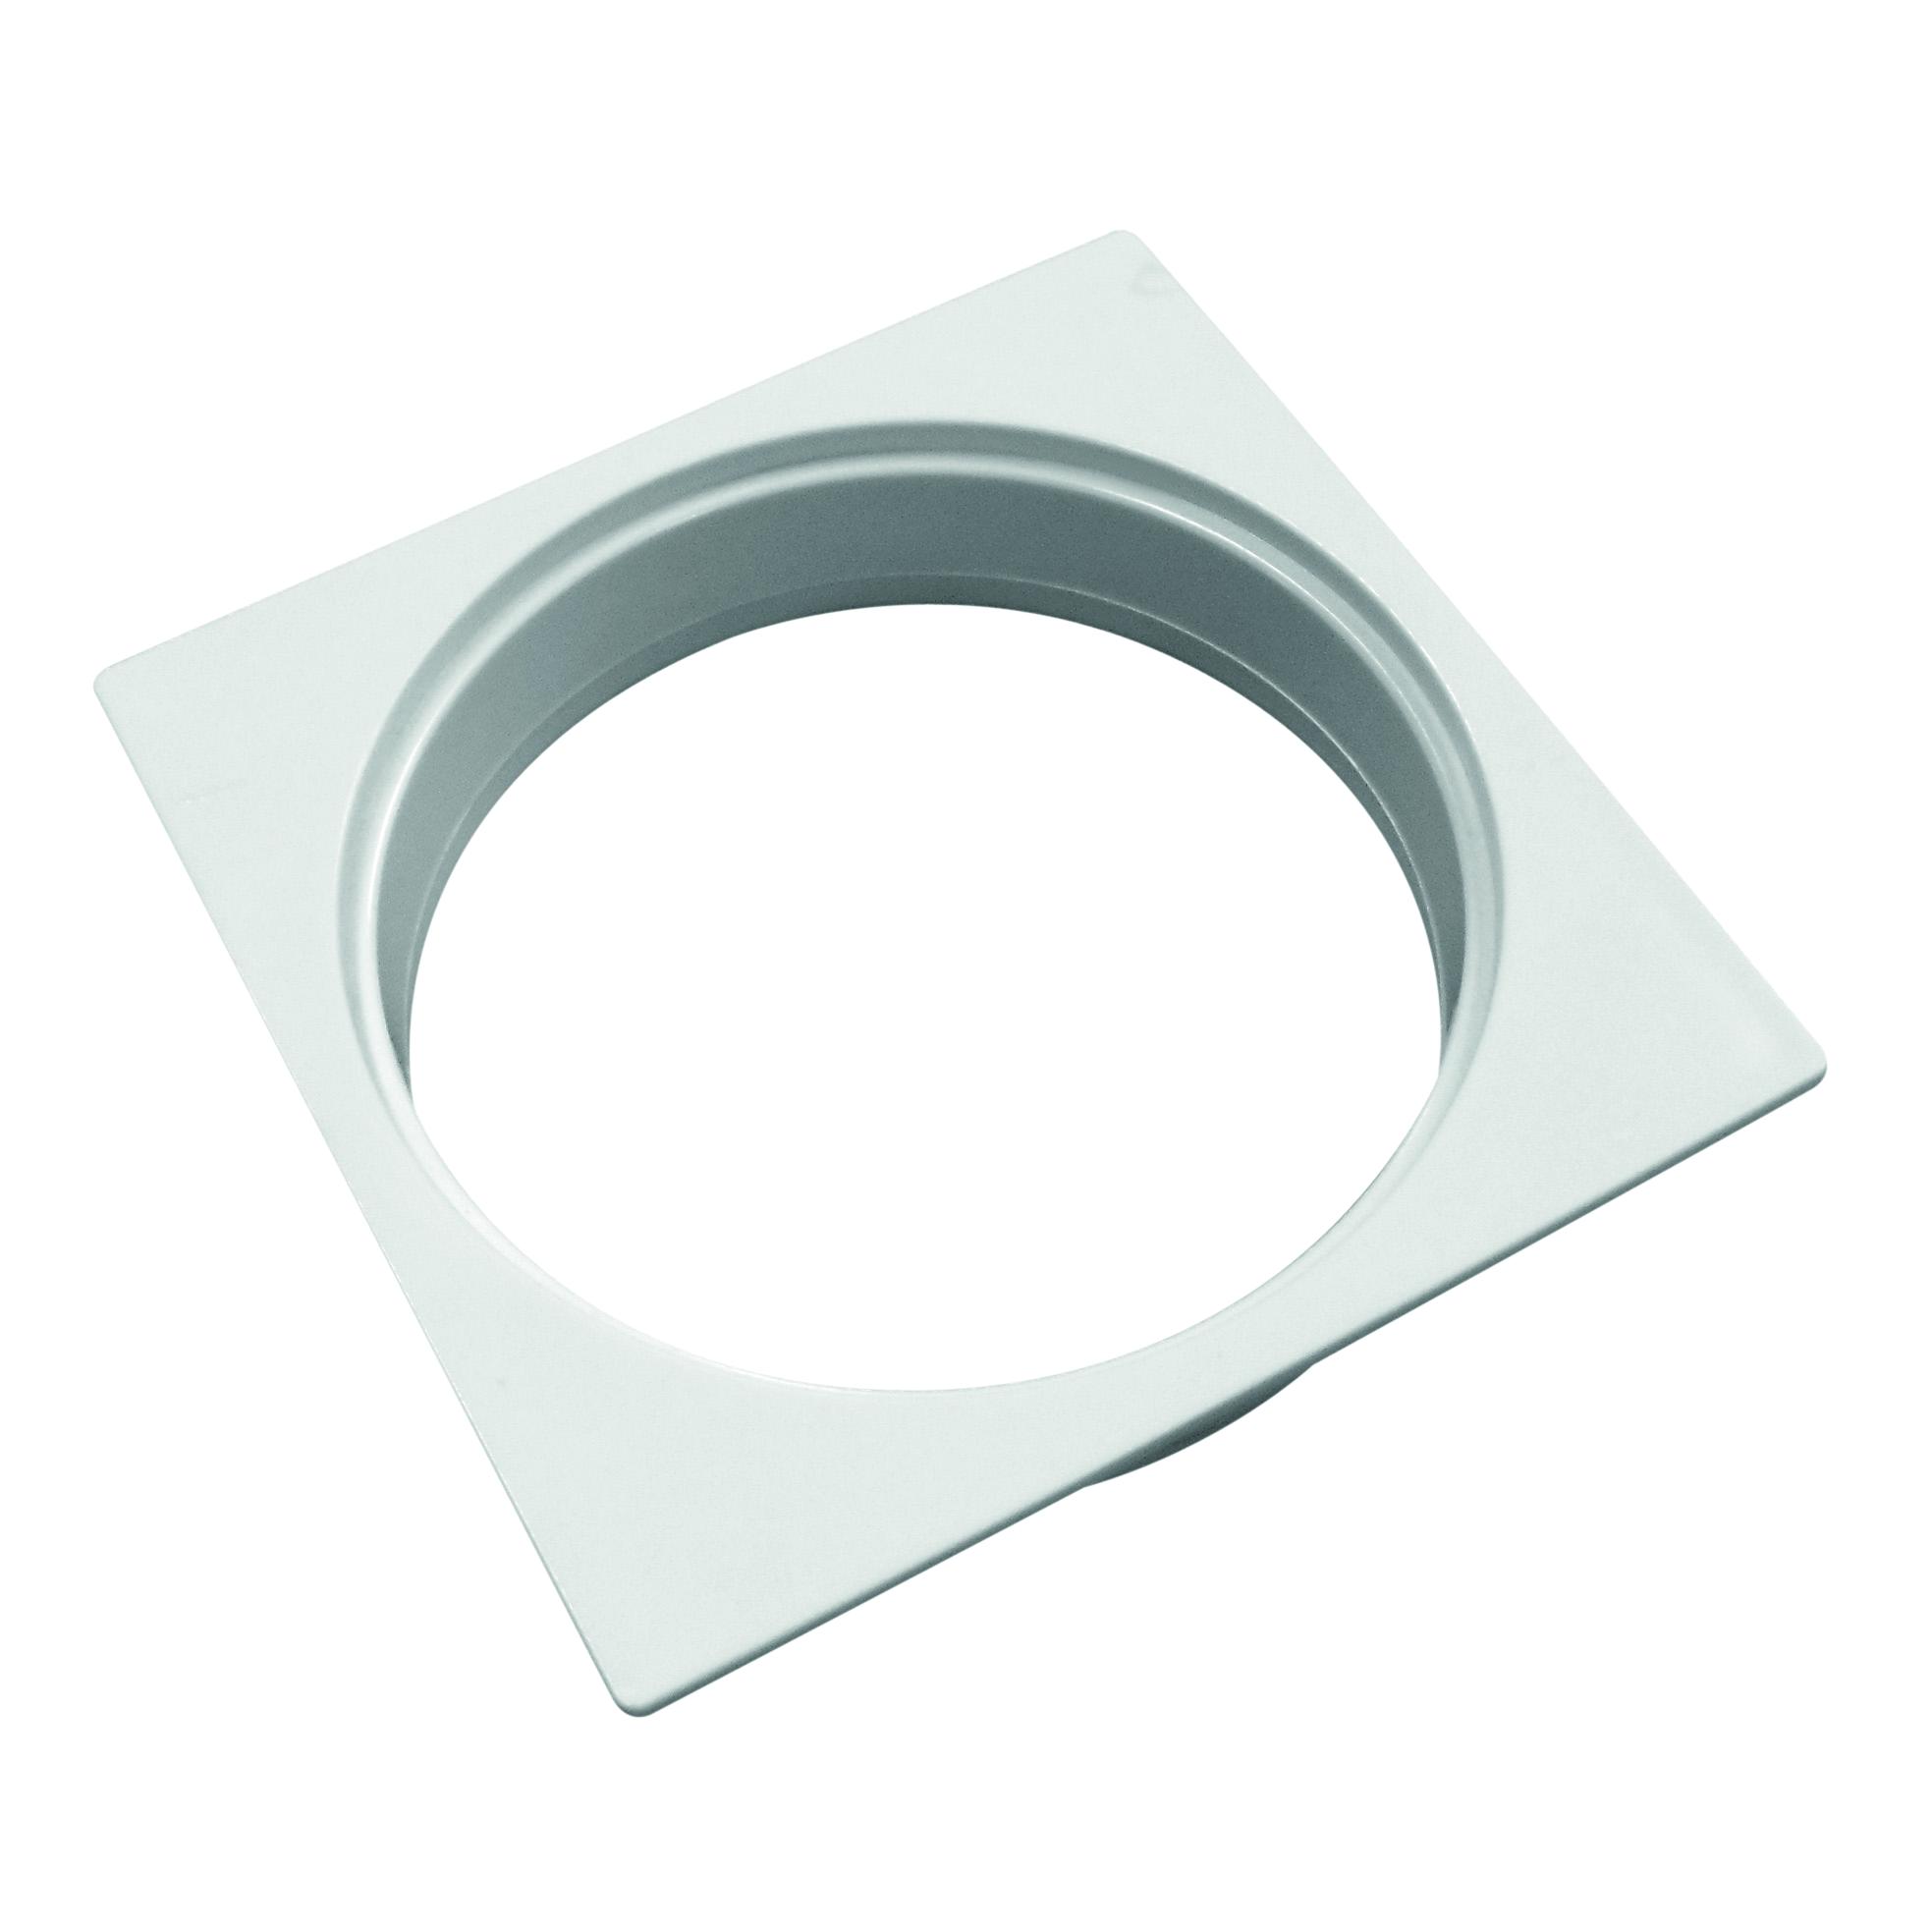 Porta-Grelha Caixa Sifonada 150 mm Quadrado Branco 11769 - Amanco